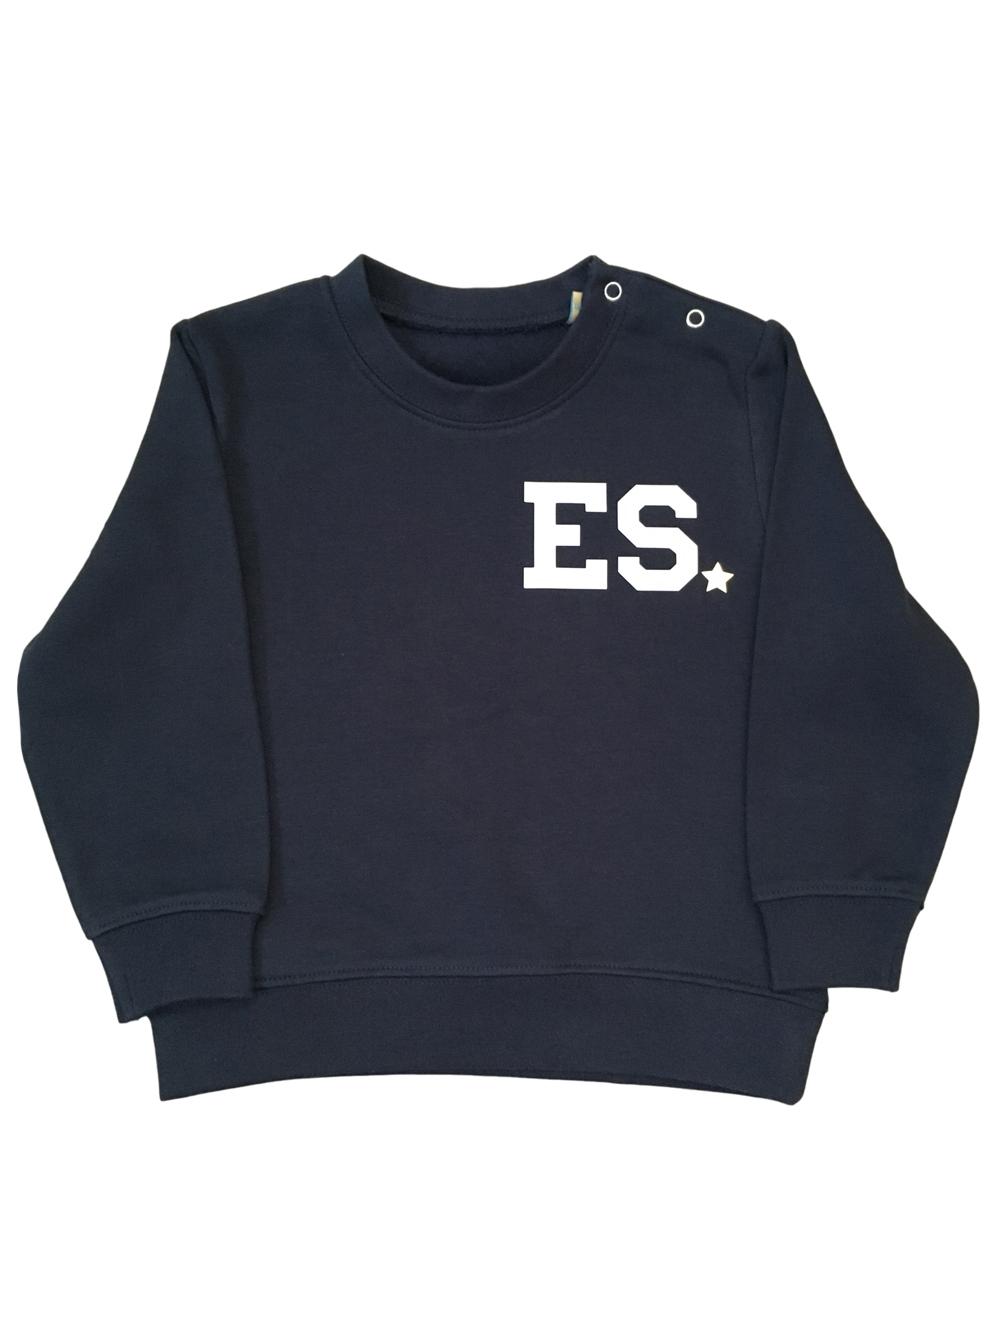 Chunky Initial Sweatshirt